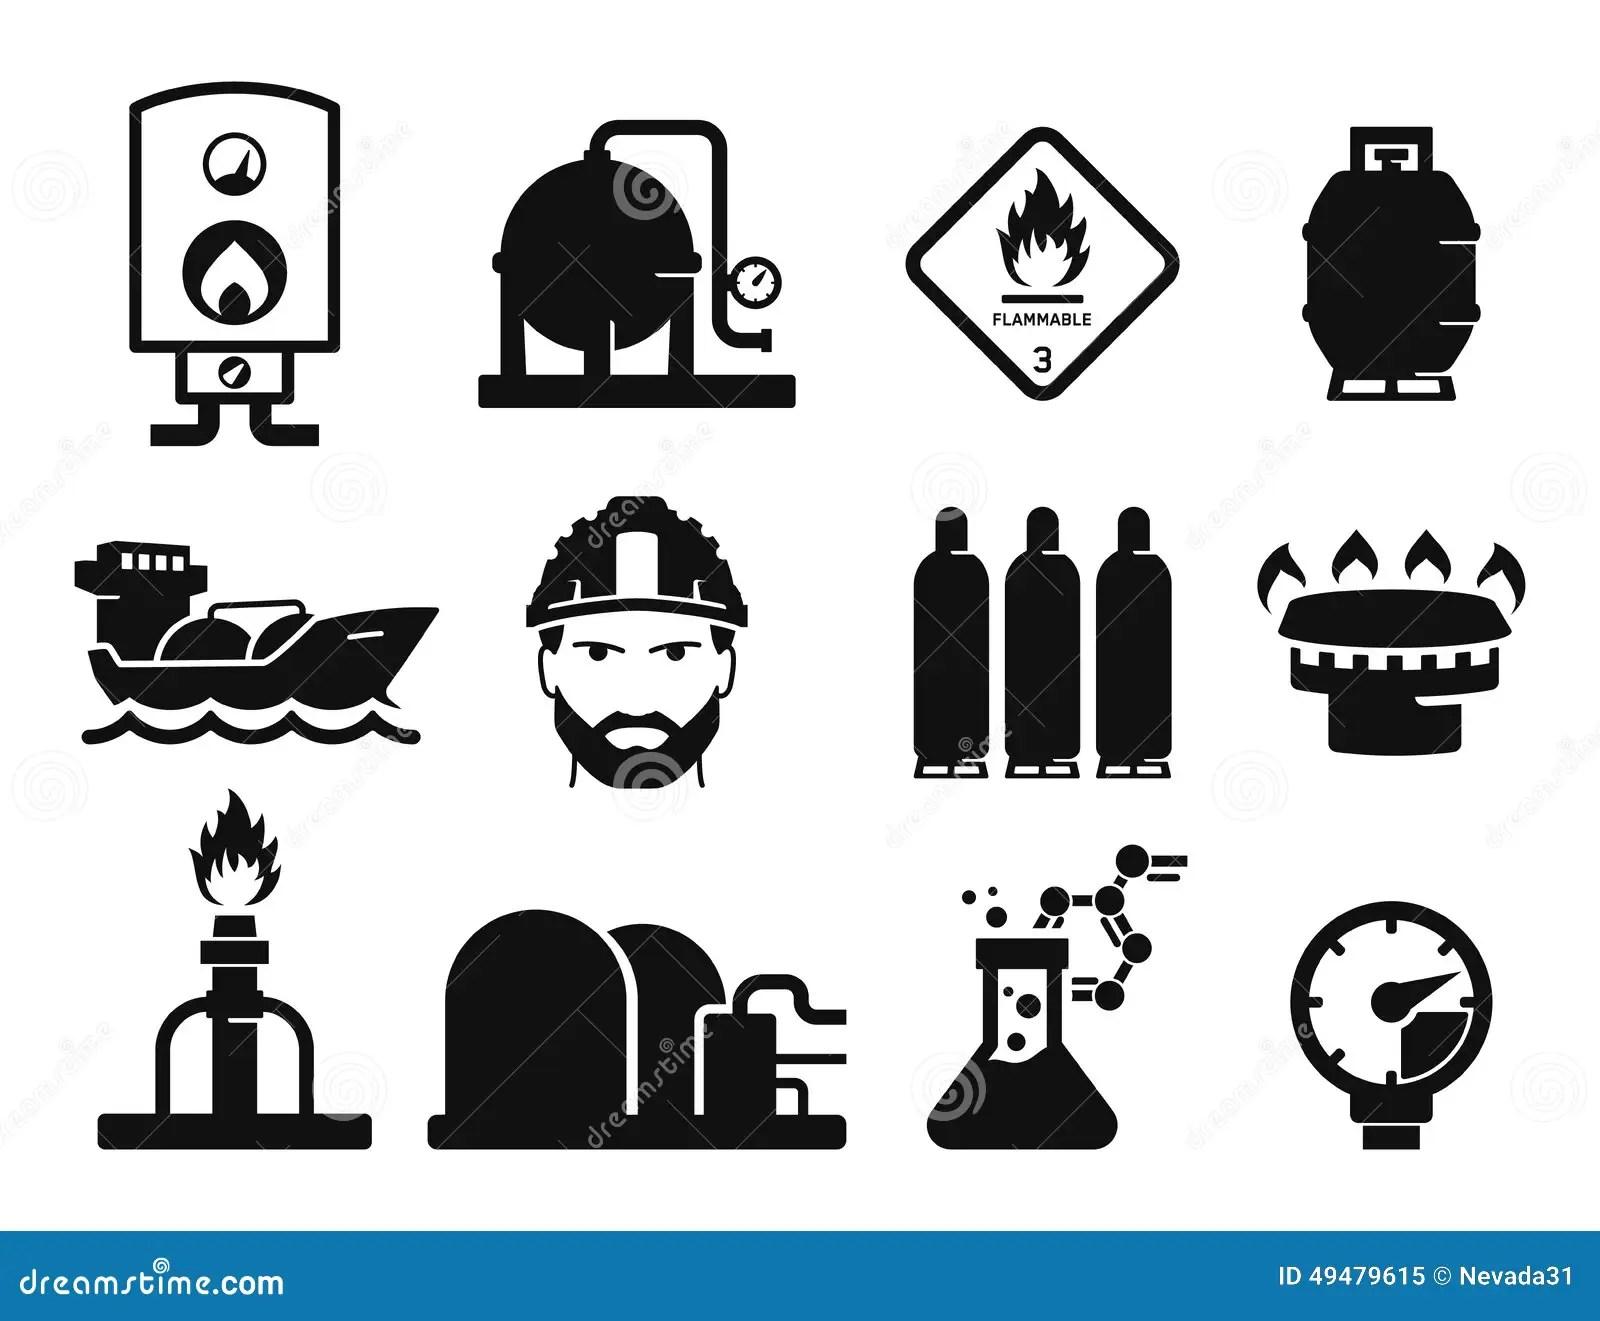 Natural Gas Fuel Filter